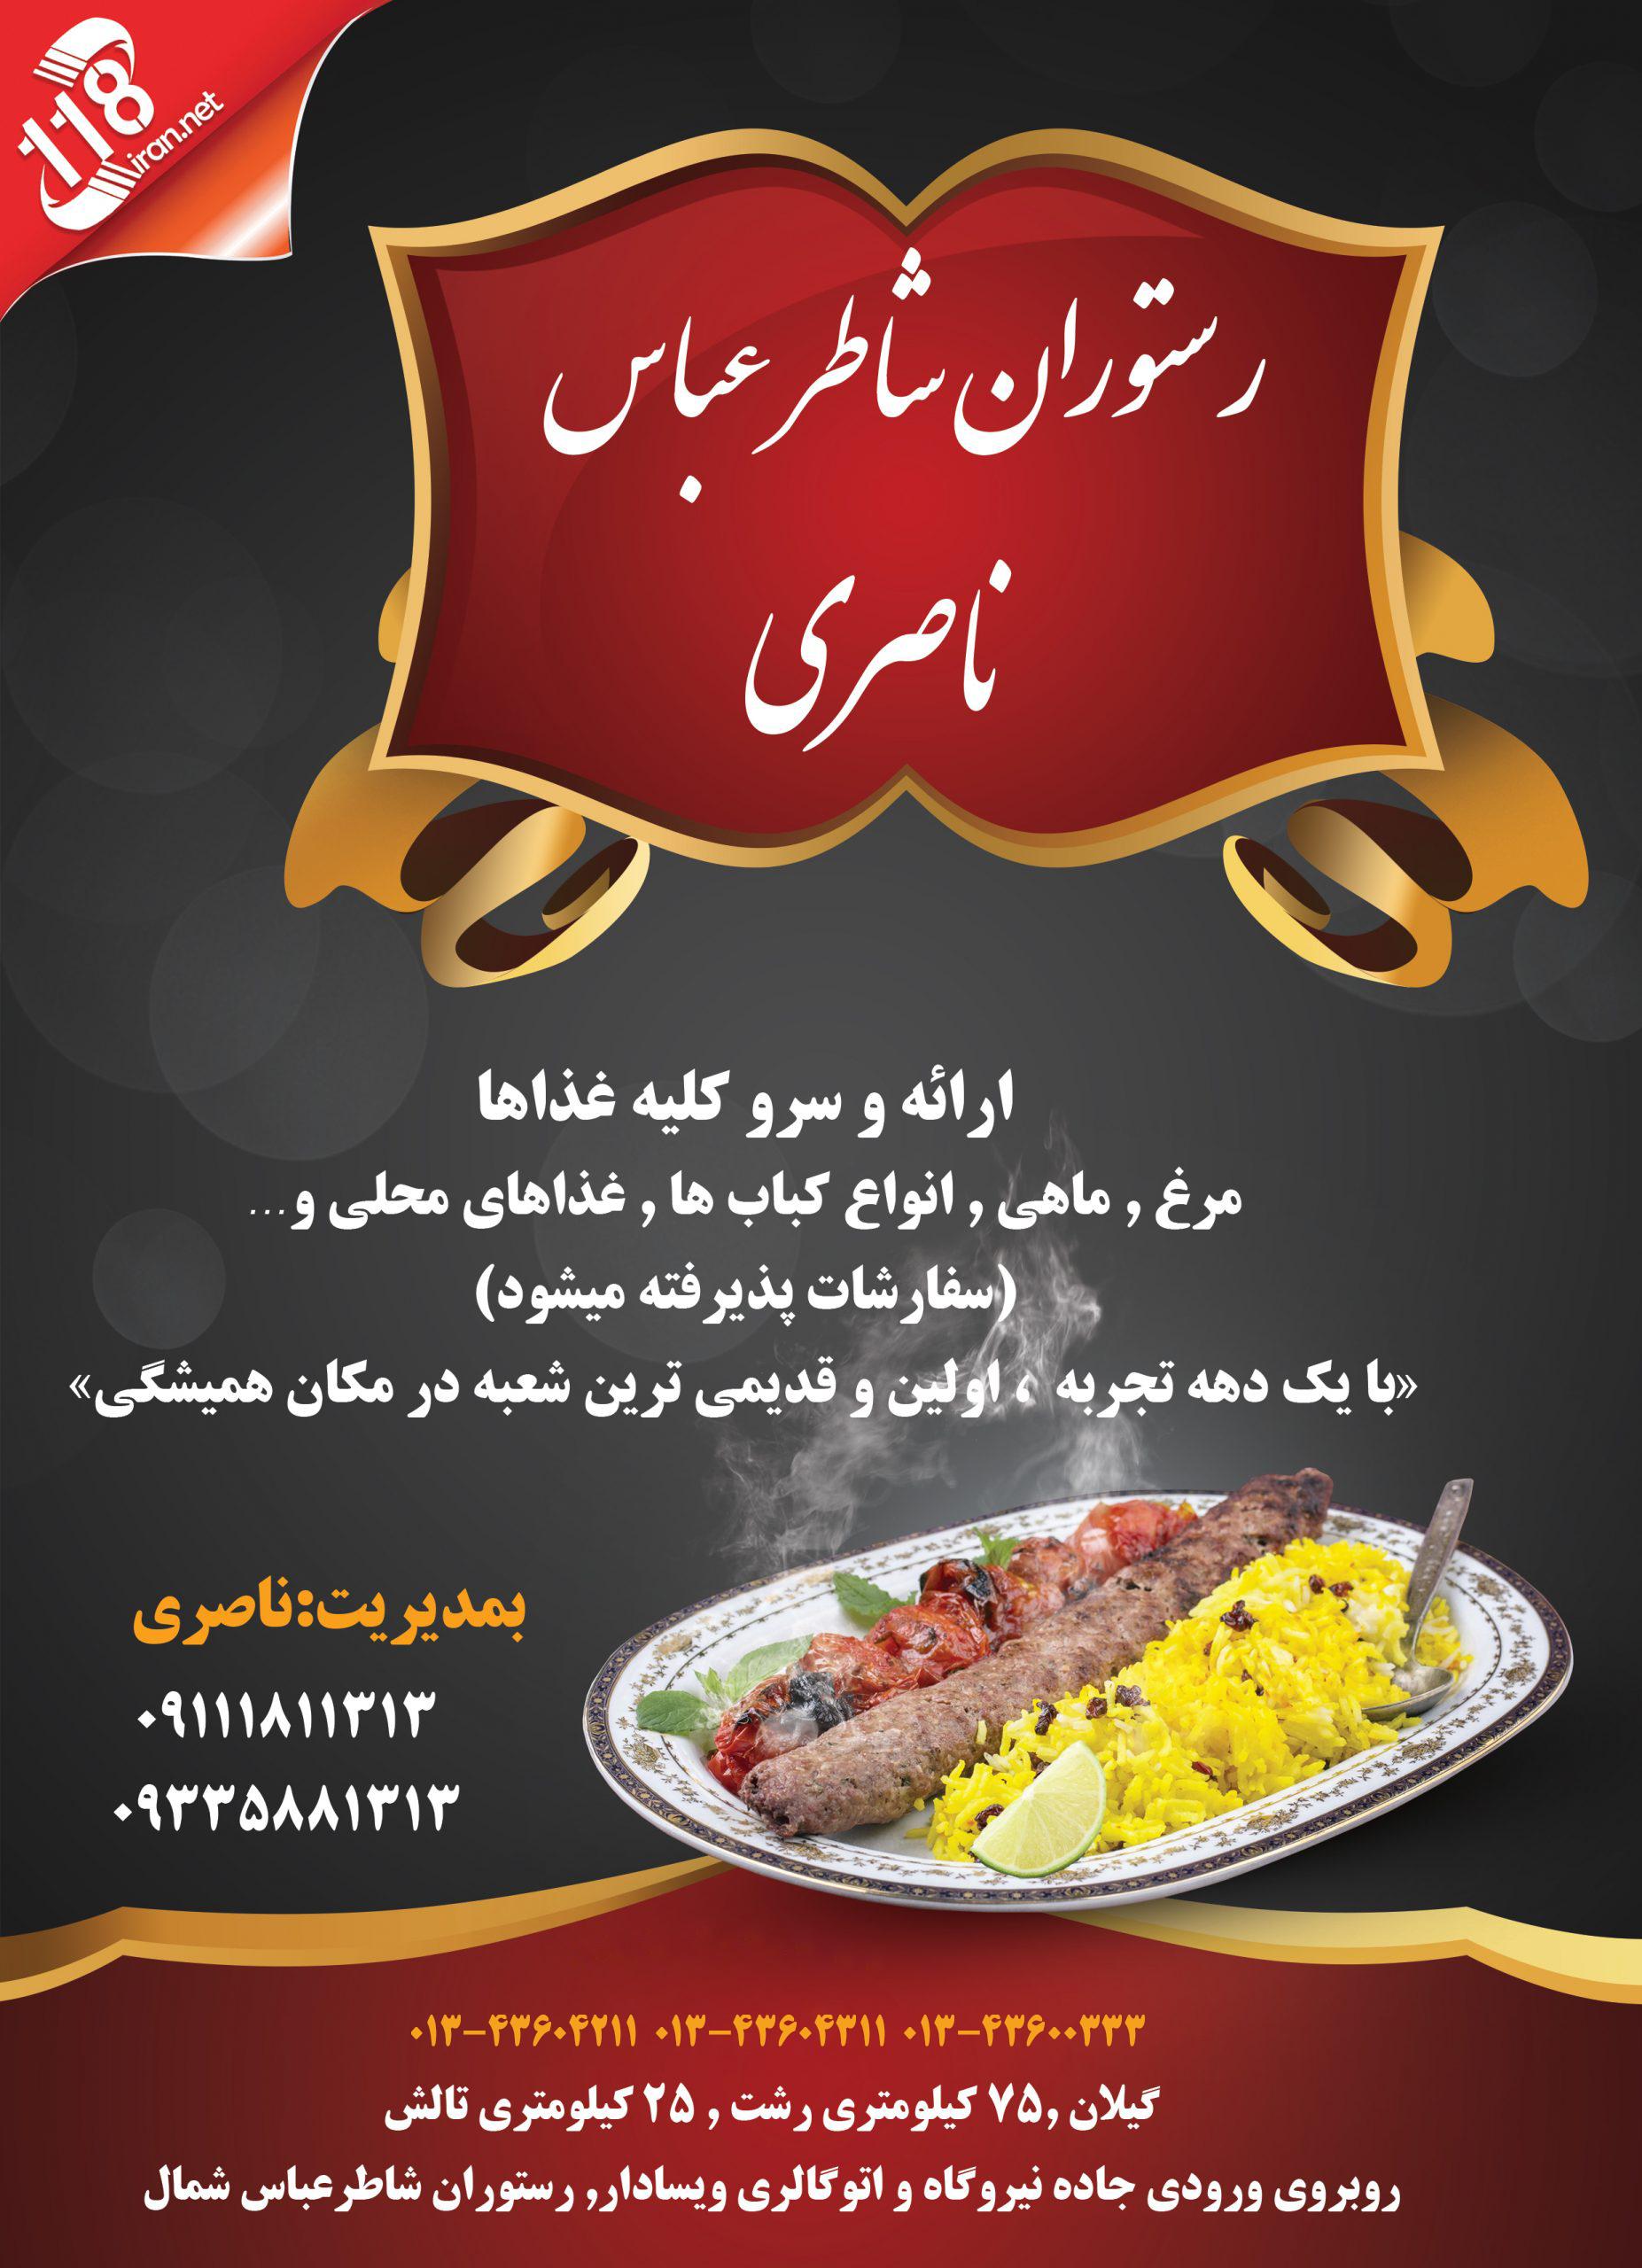 رستوران شاطر عباس شمال